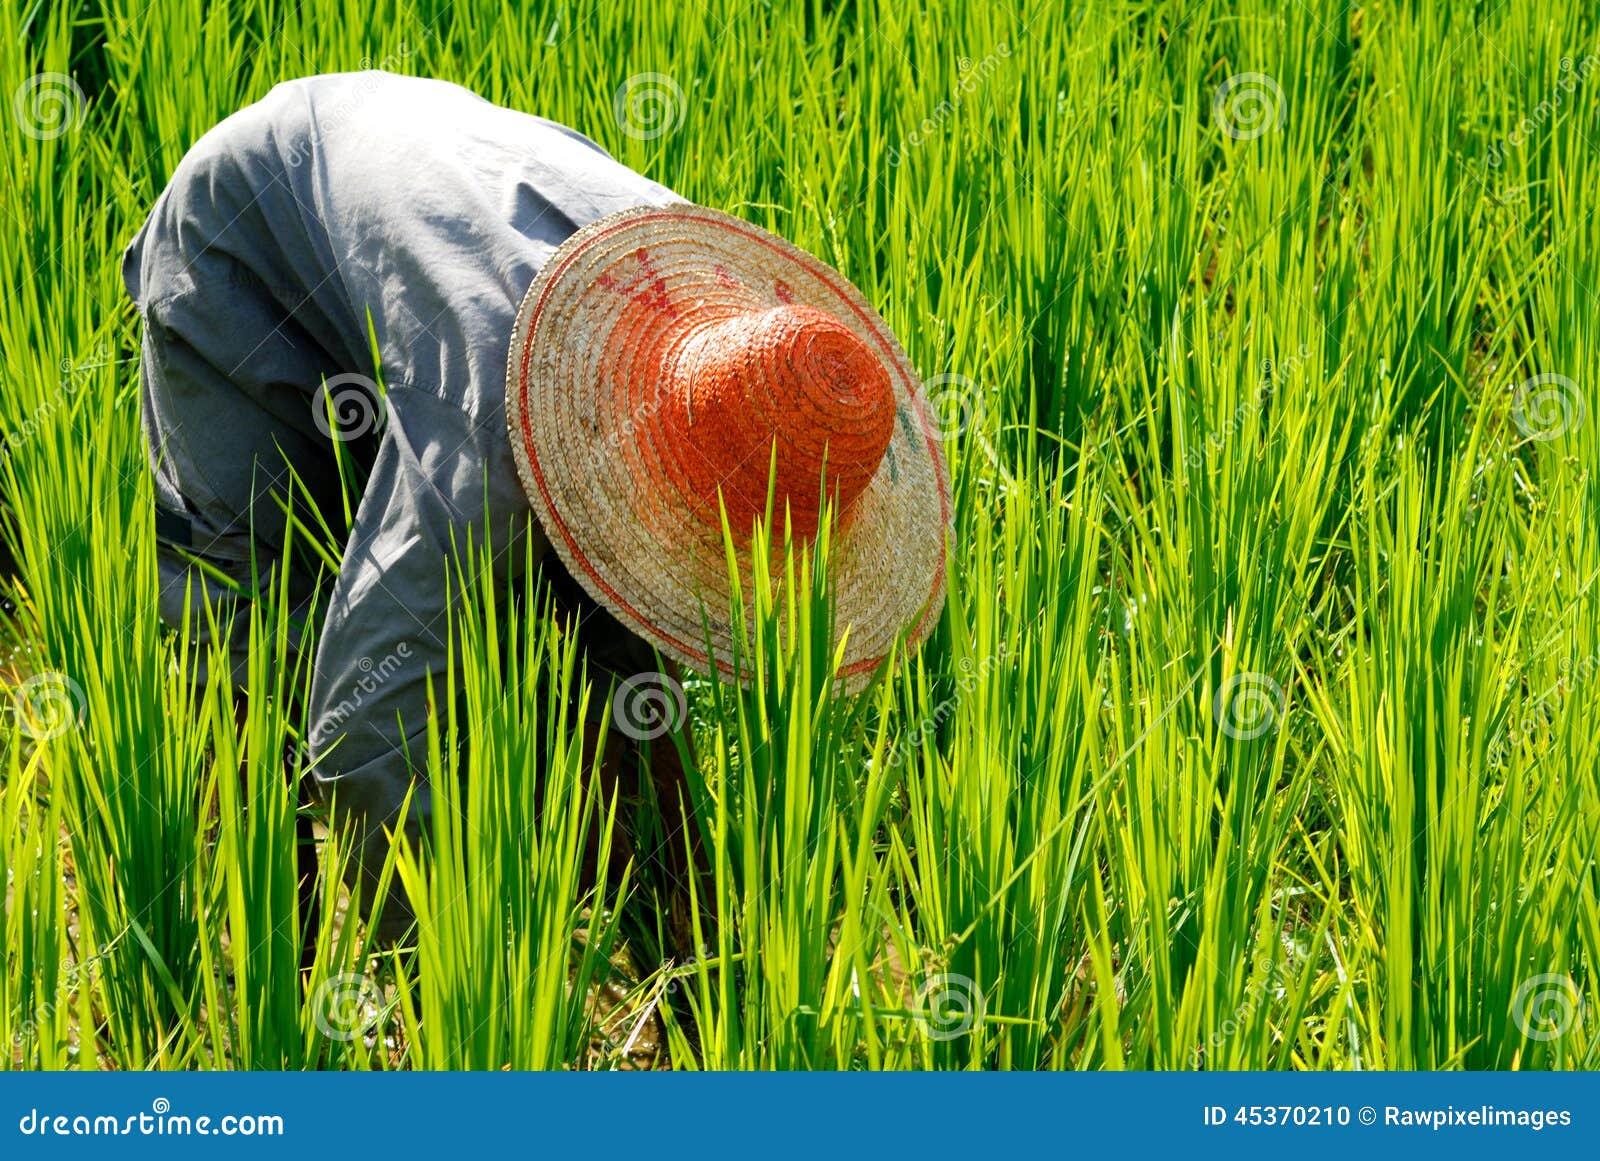 Agriculteur moissonnant le riz